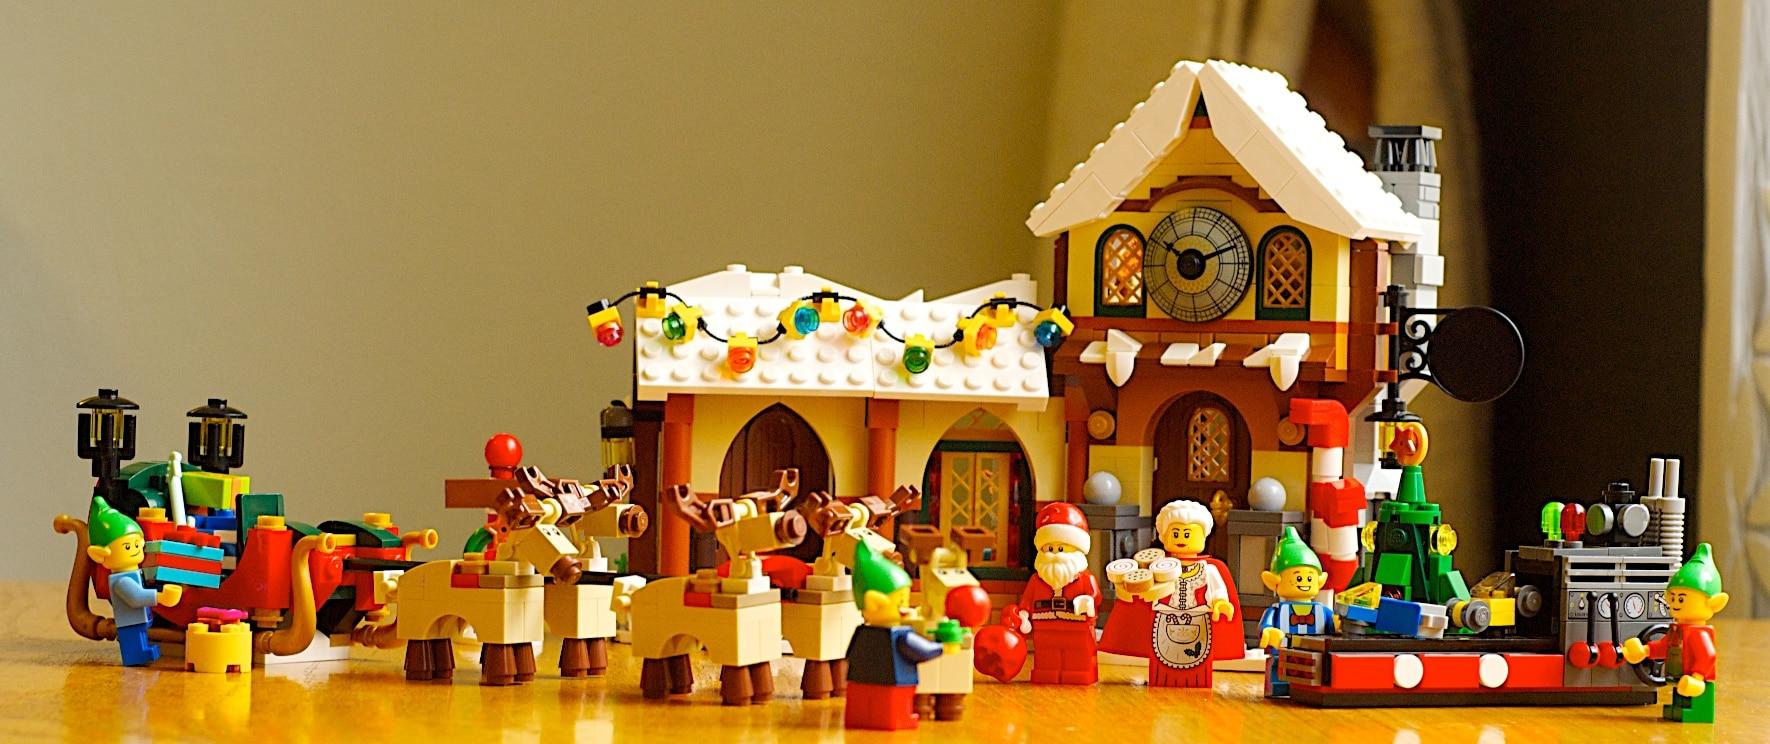 Christmas LEGO Sets Article Image